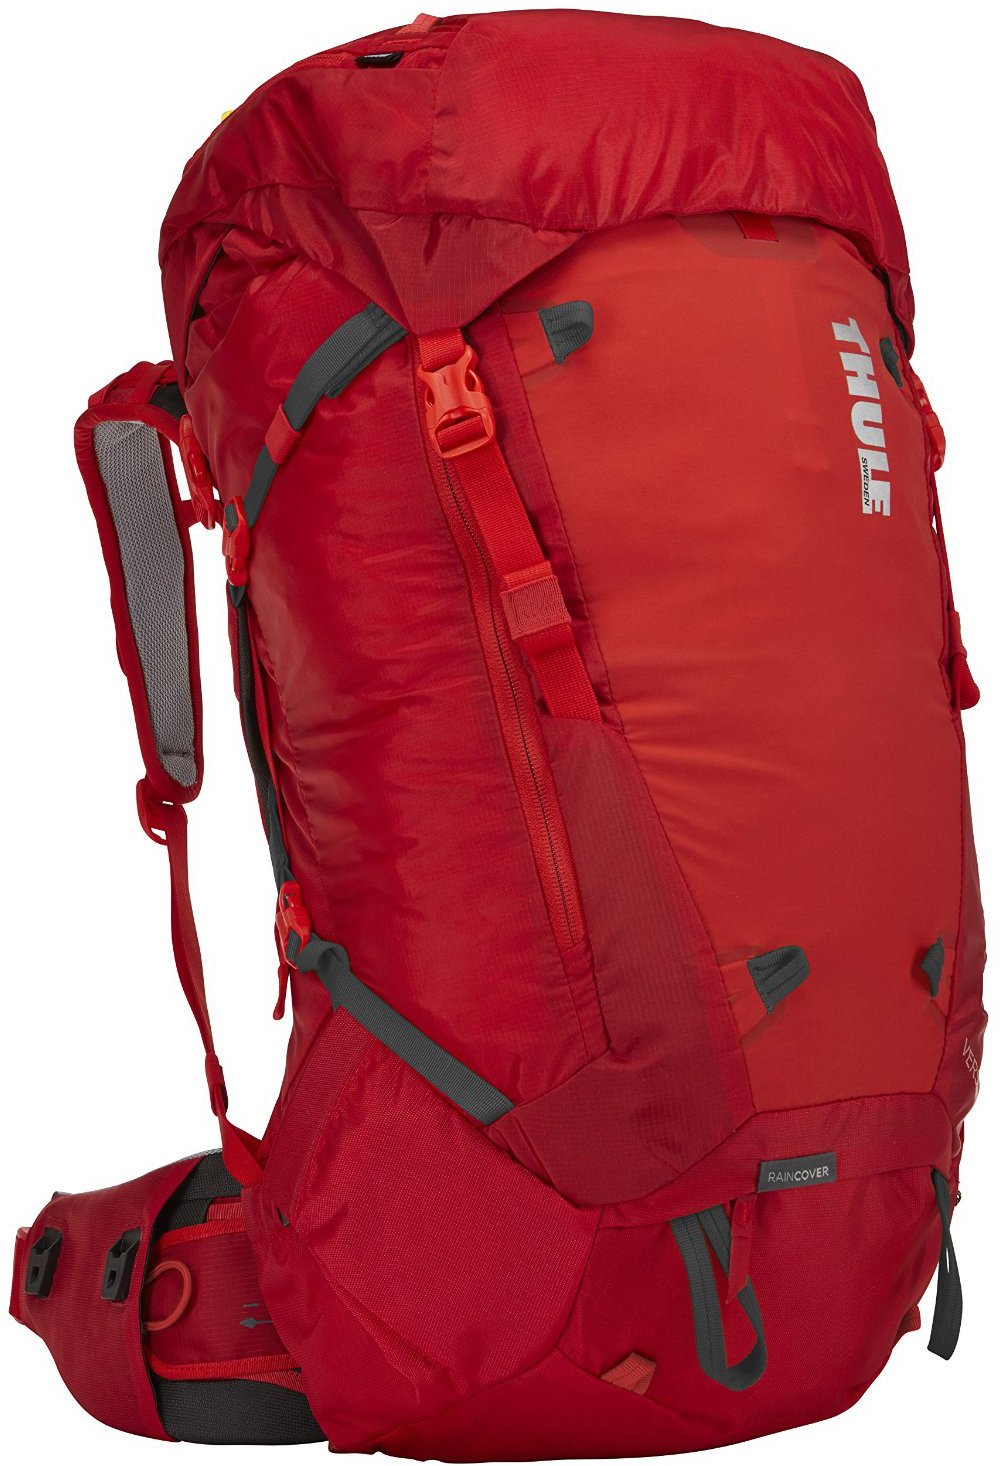 VersantТуристические рюкзаки<br>Туристический рюкзак<br>